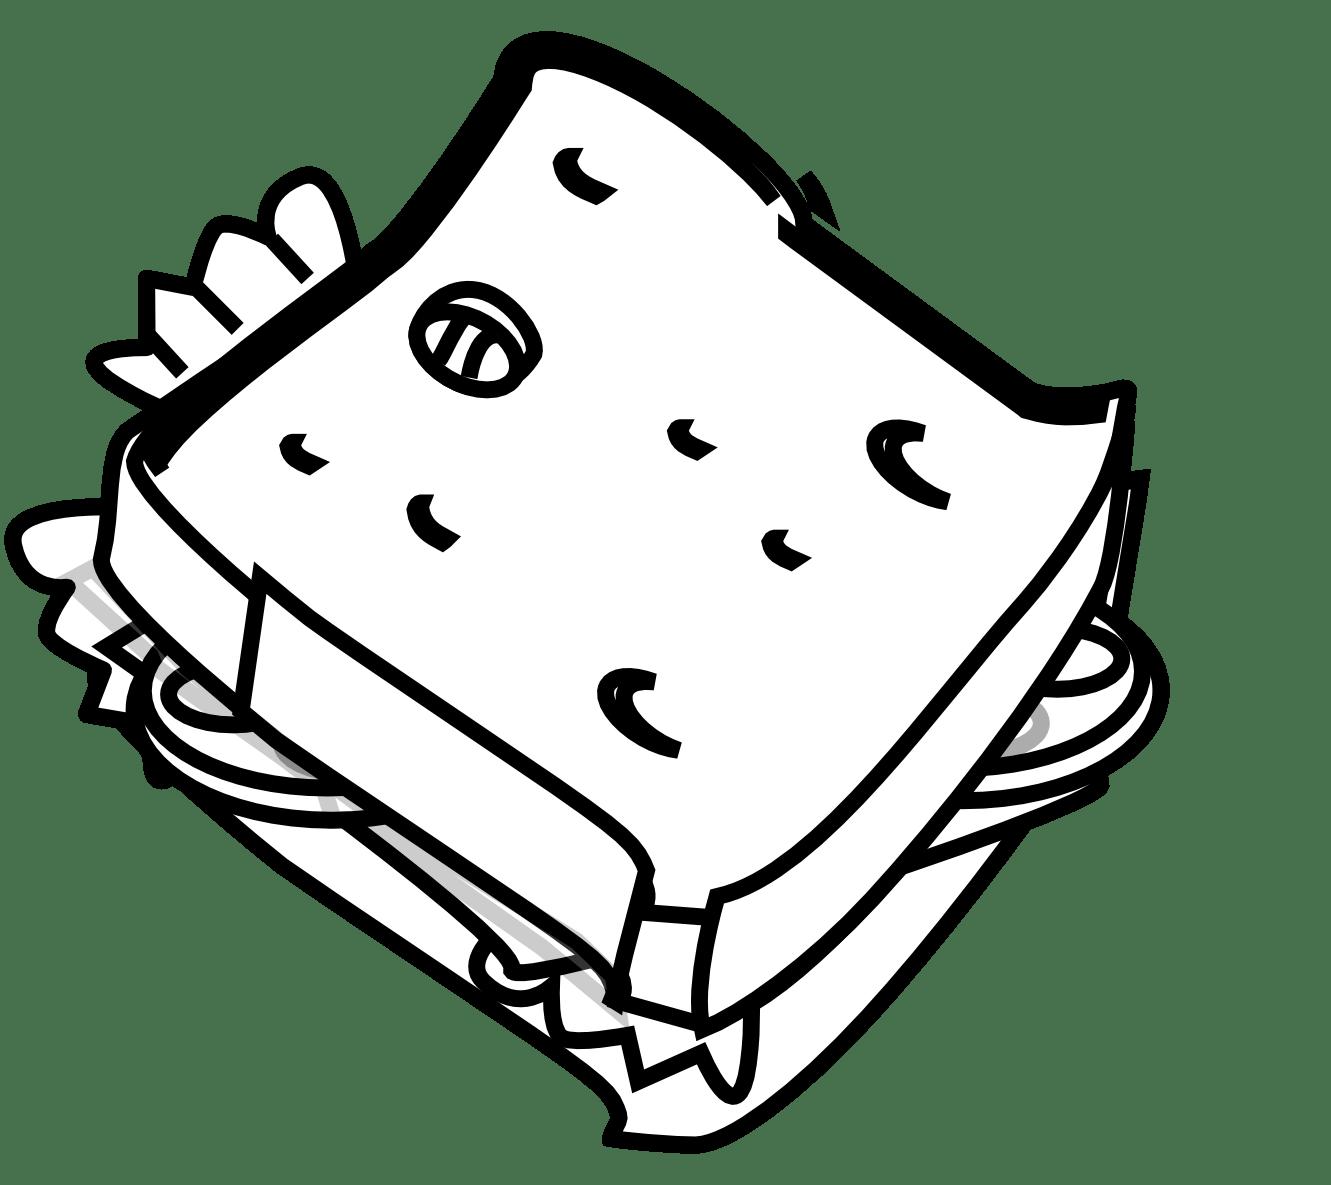 Rg 1 24 Sandwich Black White Line Art Scalable